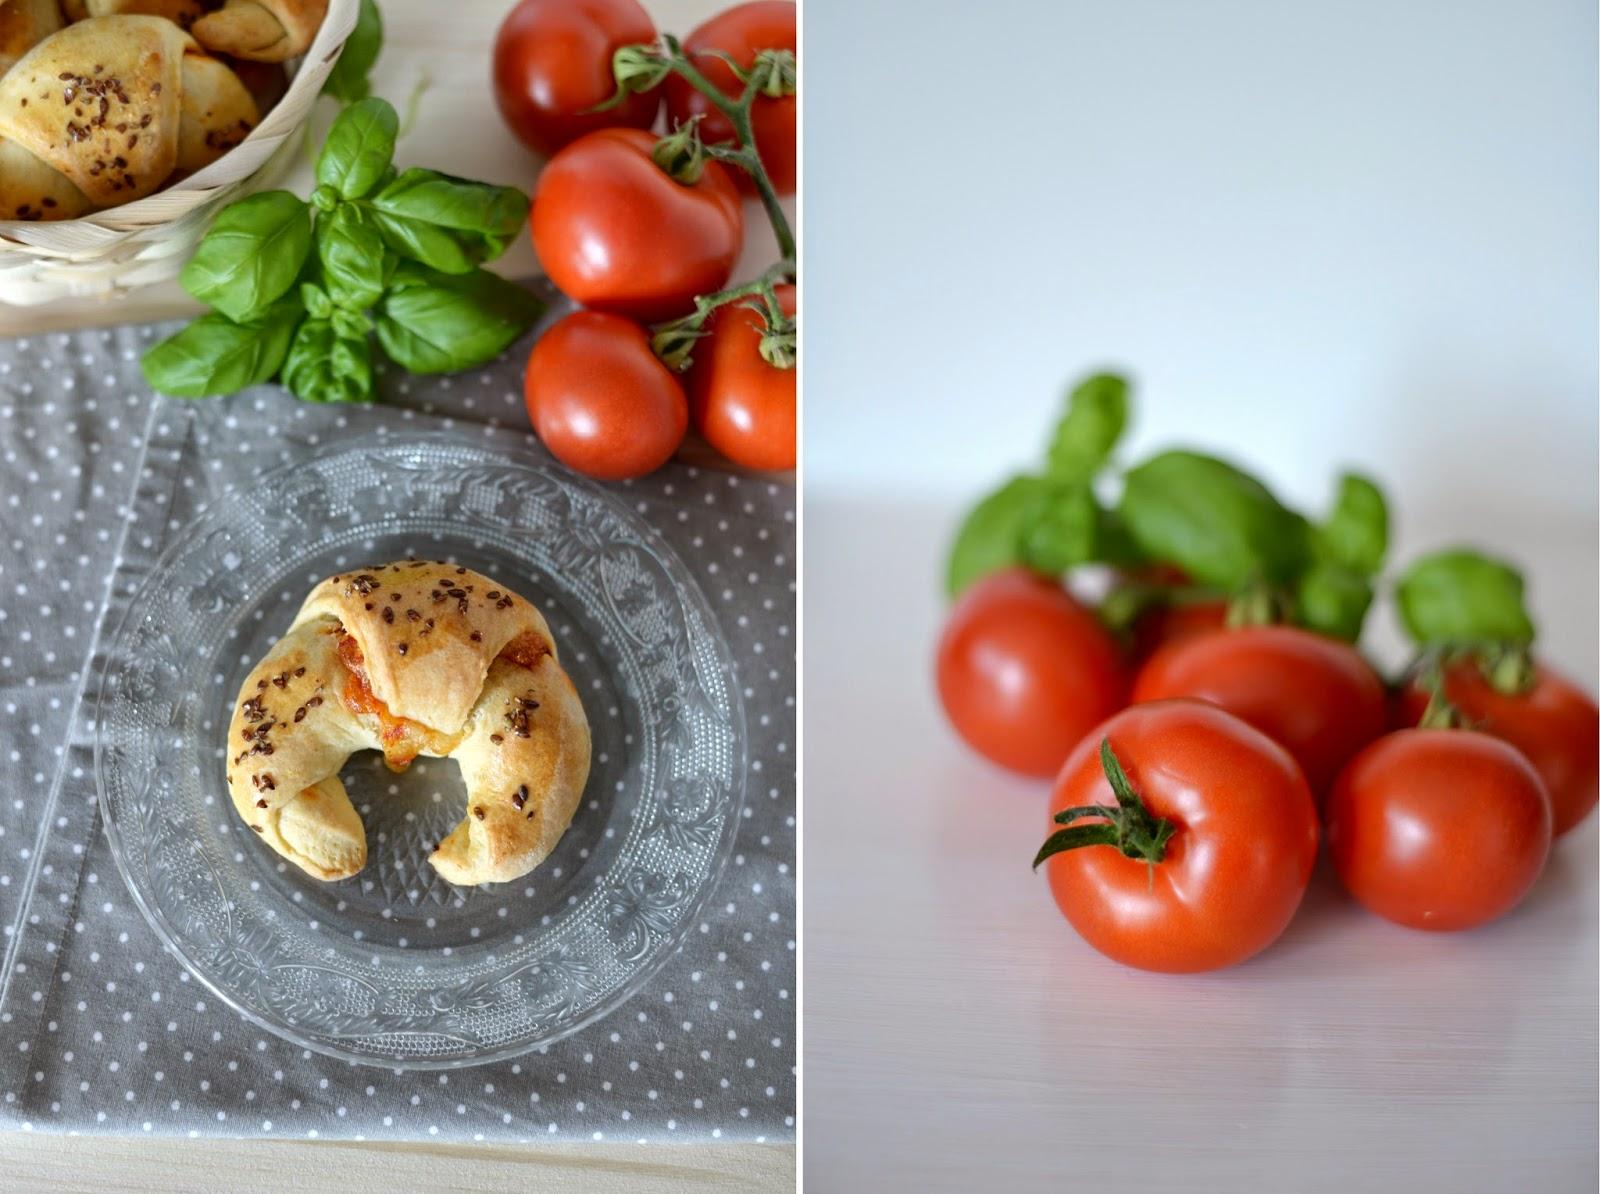 kipferlundkrapferl, rezept, recipe, blog, foodblog, foodblogger, food, tomate, mozzarella, tomato, kipferl, hörnchen, lecker, yummy, herzhaft, frühstück, jause, party, snack, partysnack